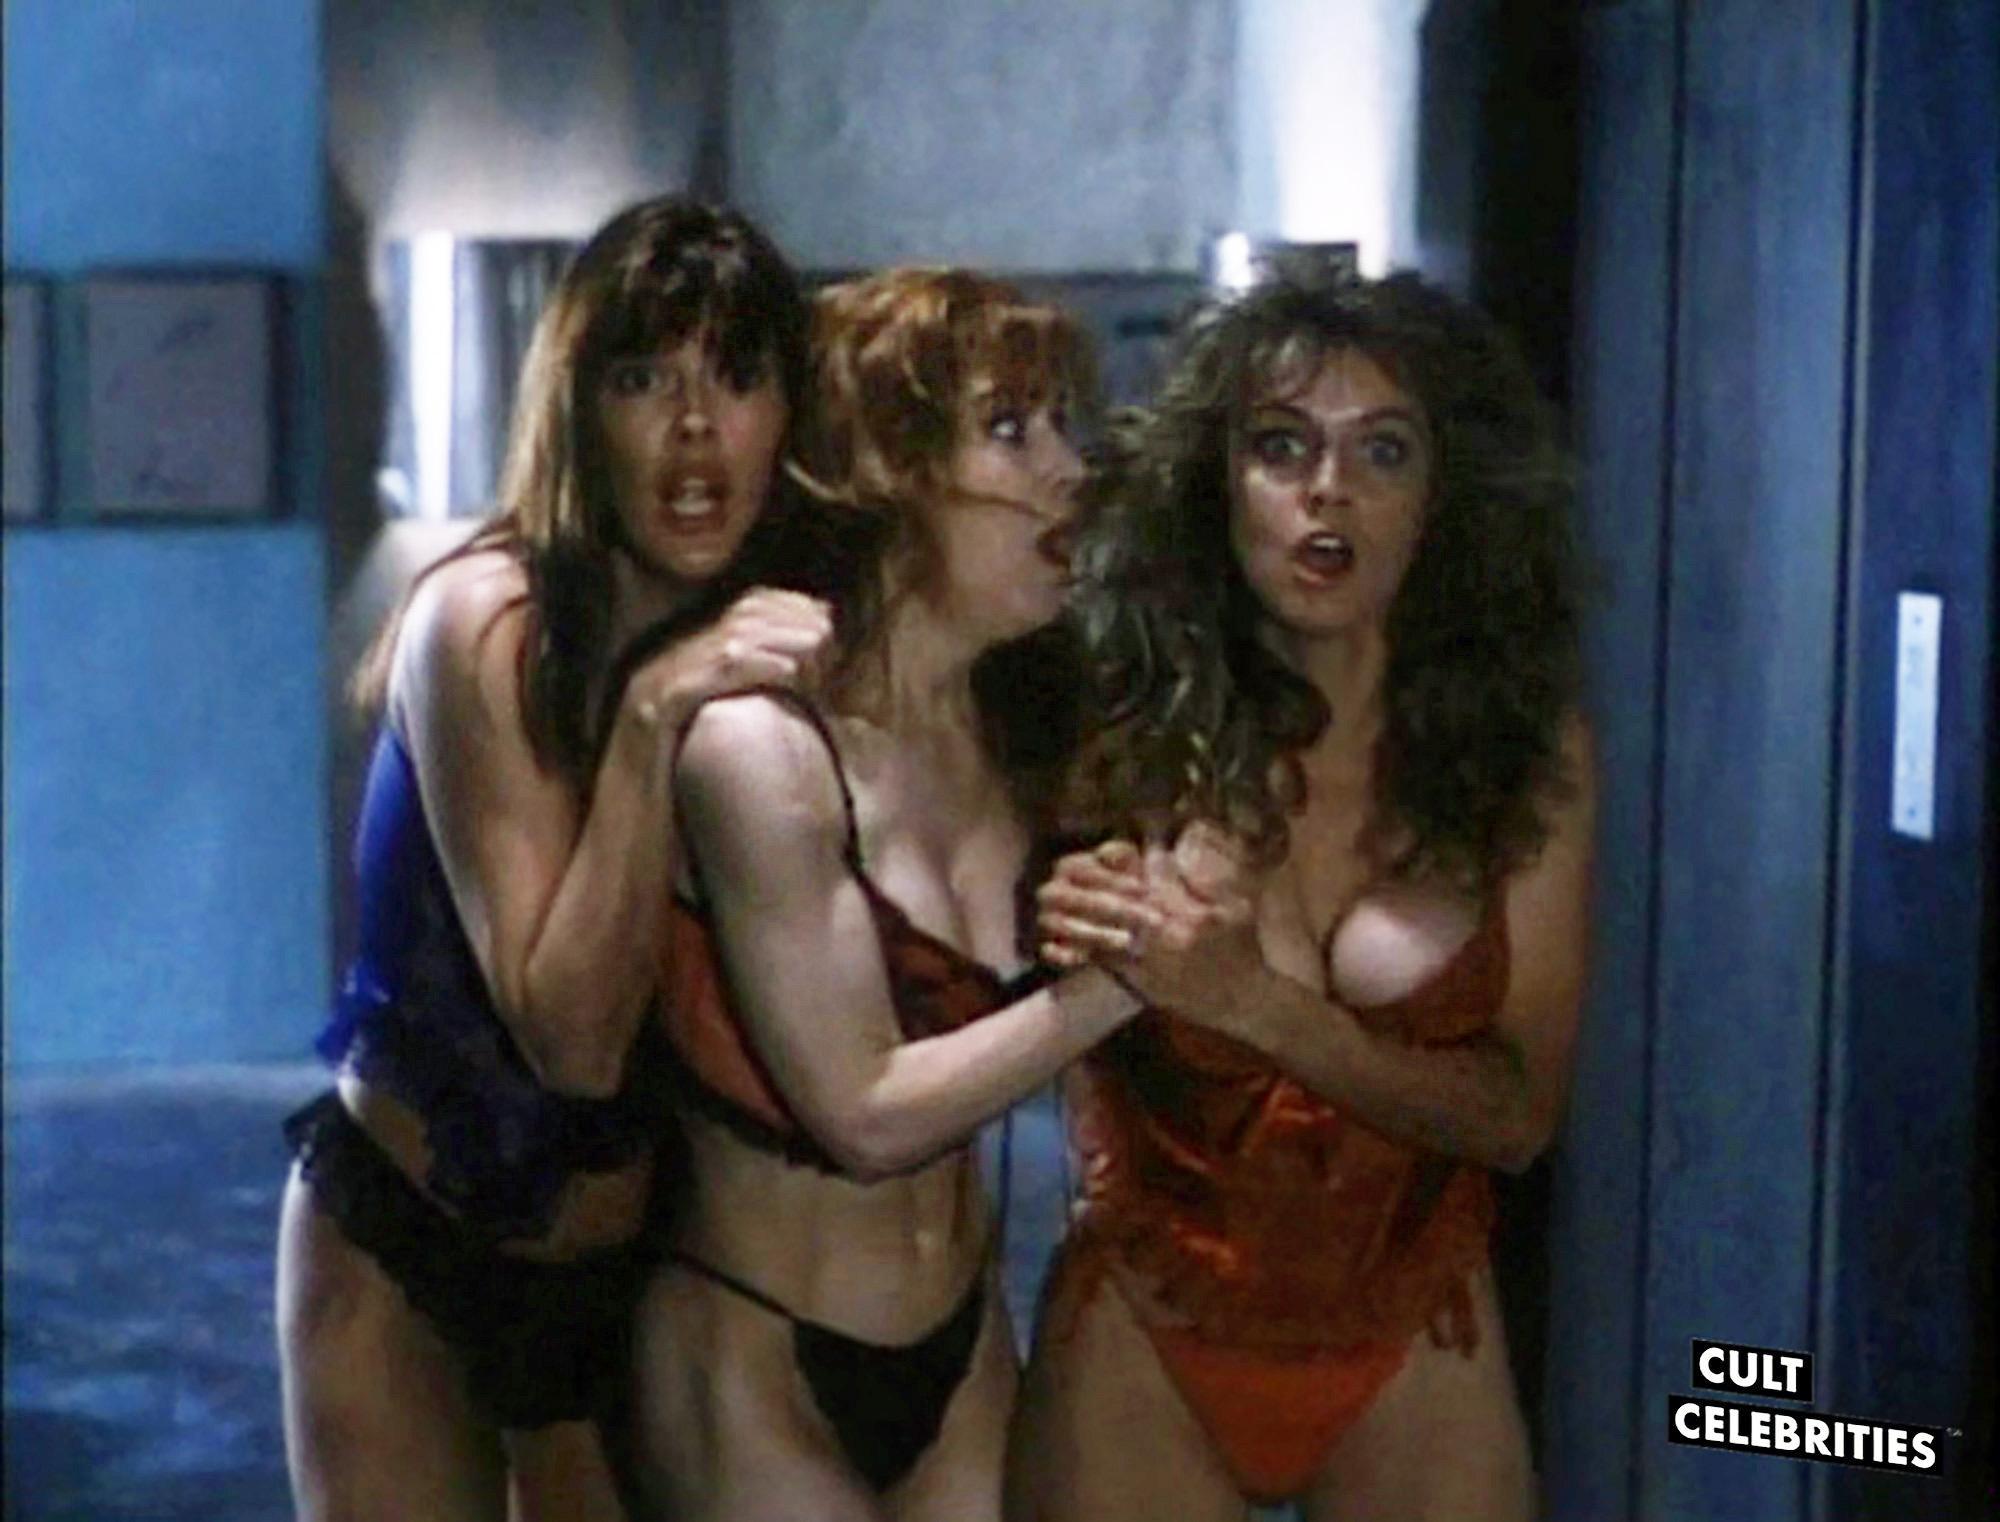 Gail Thackray, Bridget Carney and Karen Mayo-Chandler in Hard to Die (1990)